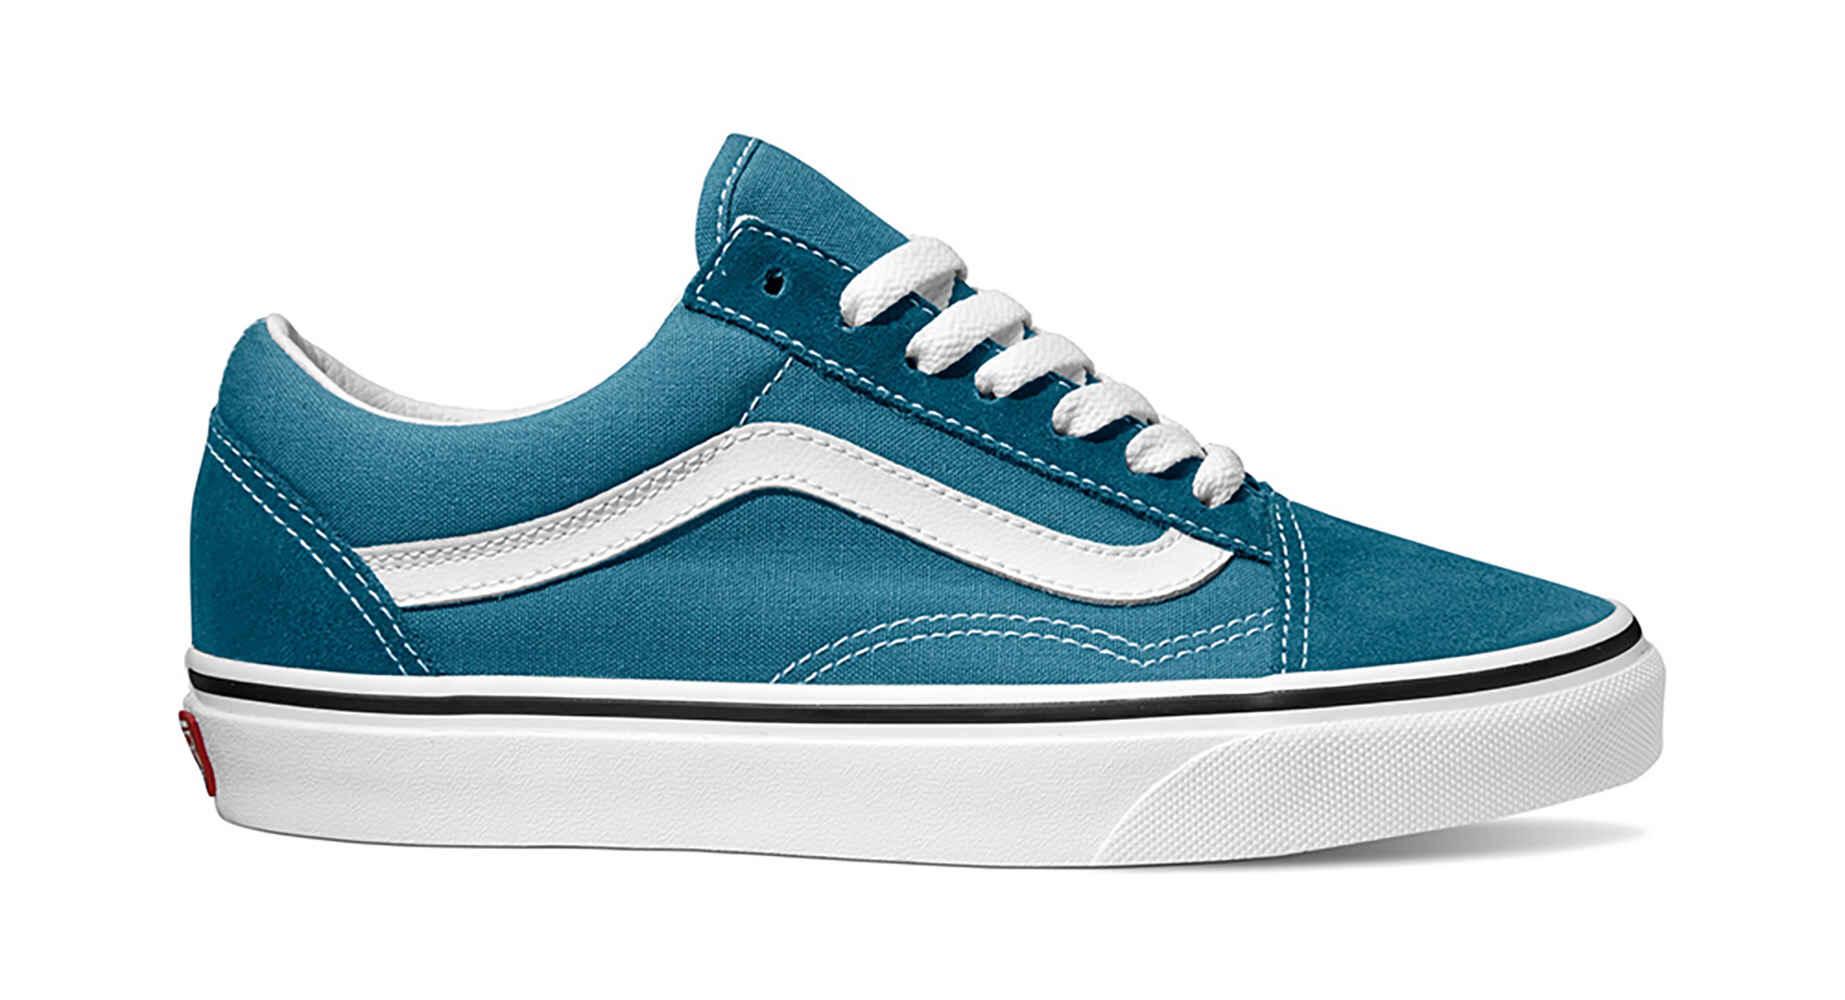 d5070006bd VANS OLD SKOOL SHOE - CORSAIR BLUE TRUE WHITE - Footwear-Shoes   Sequence  Surf Shop - VANS S18